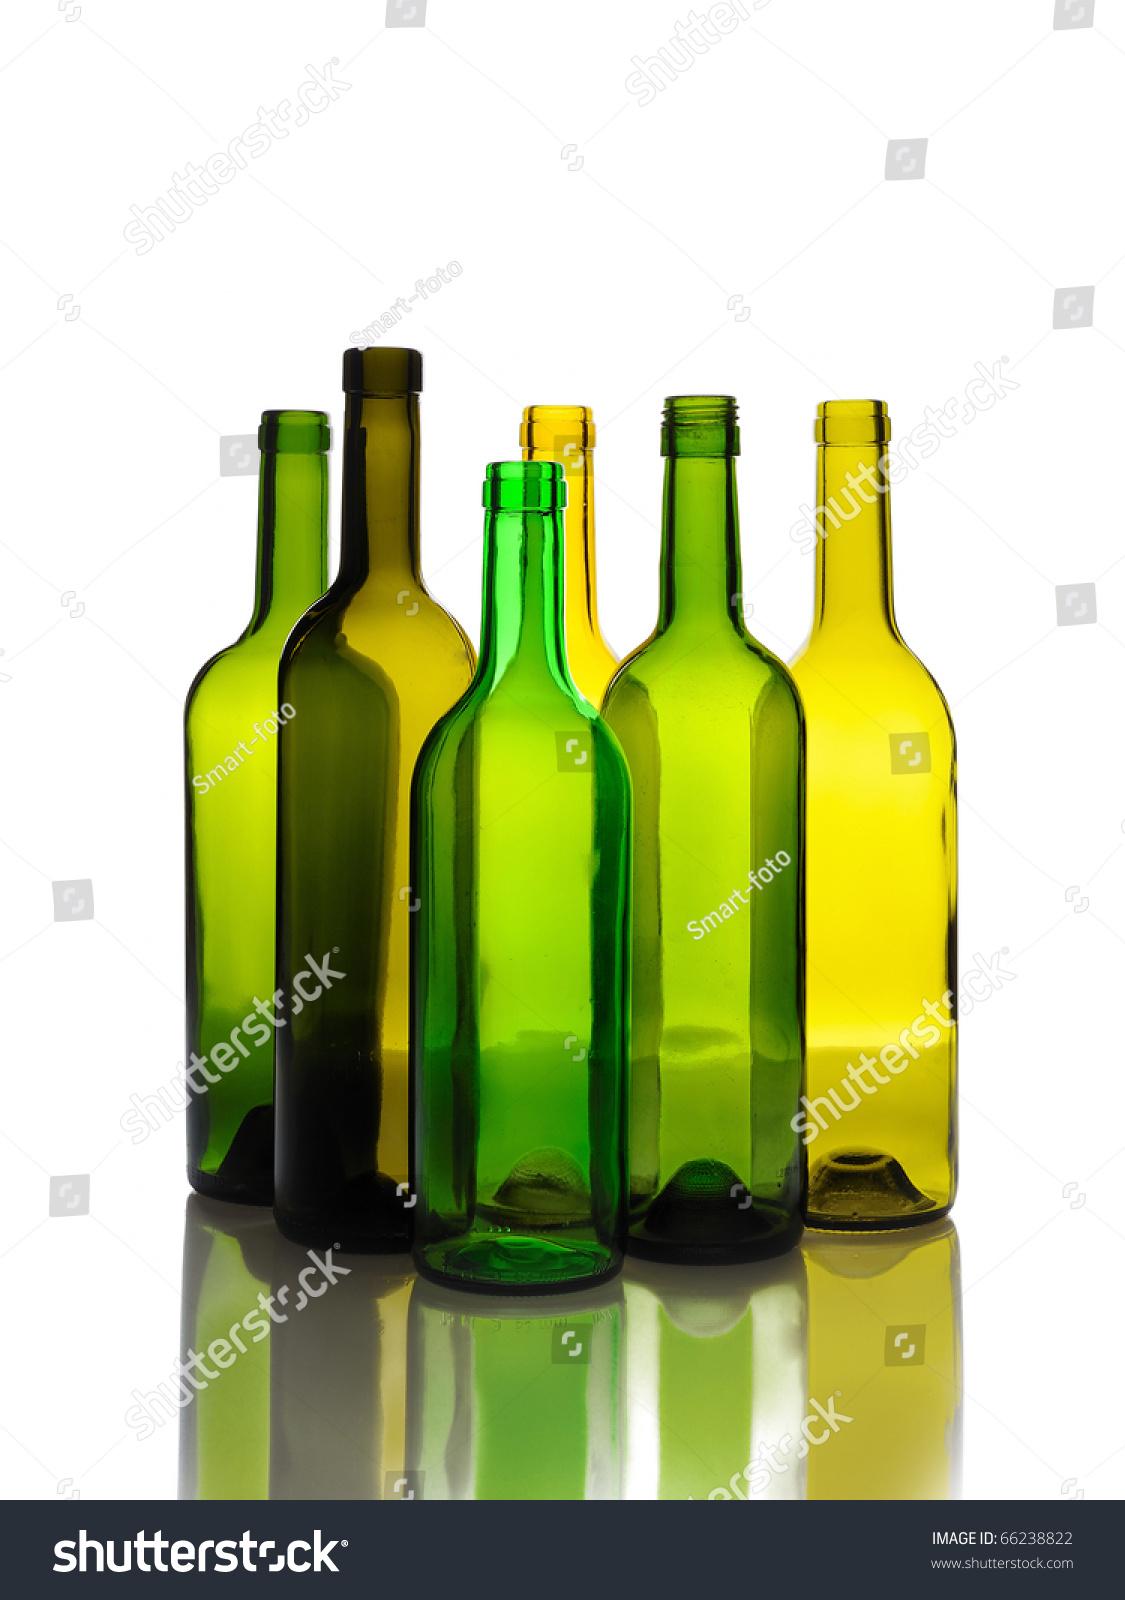 Many empty green wine bottles isolated stock photo for Green wine bottles